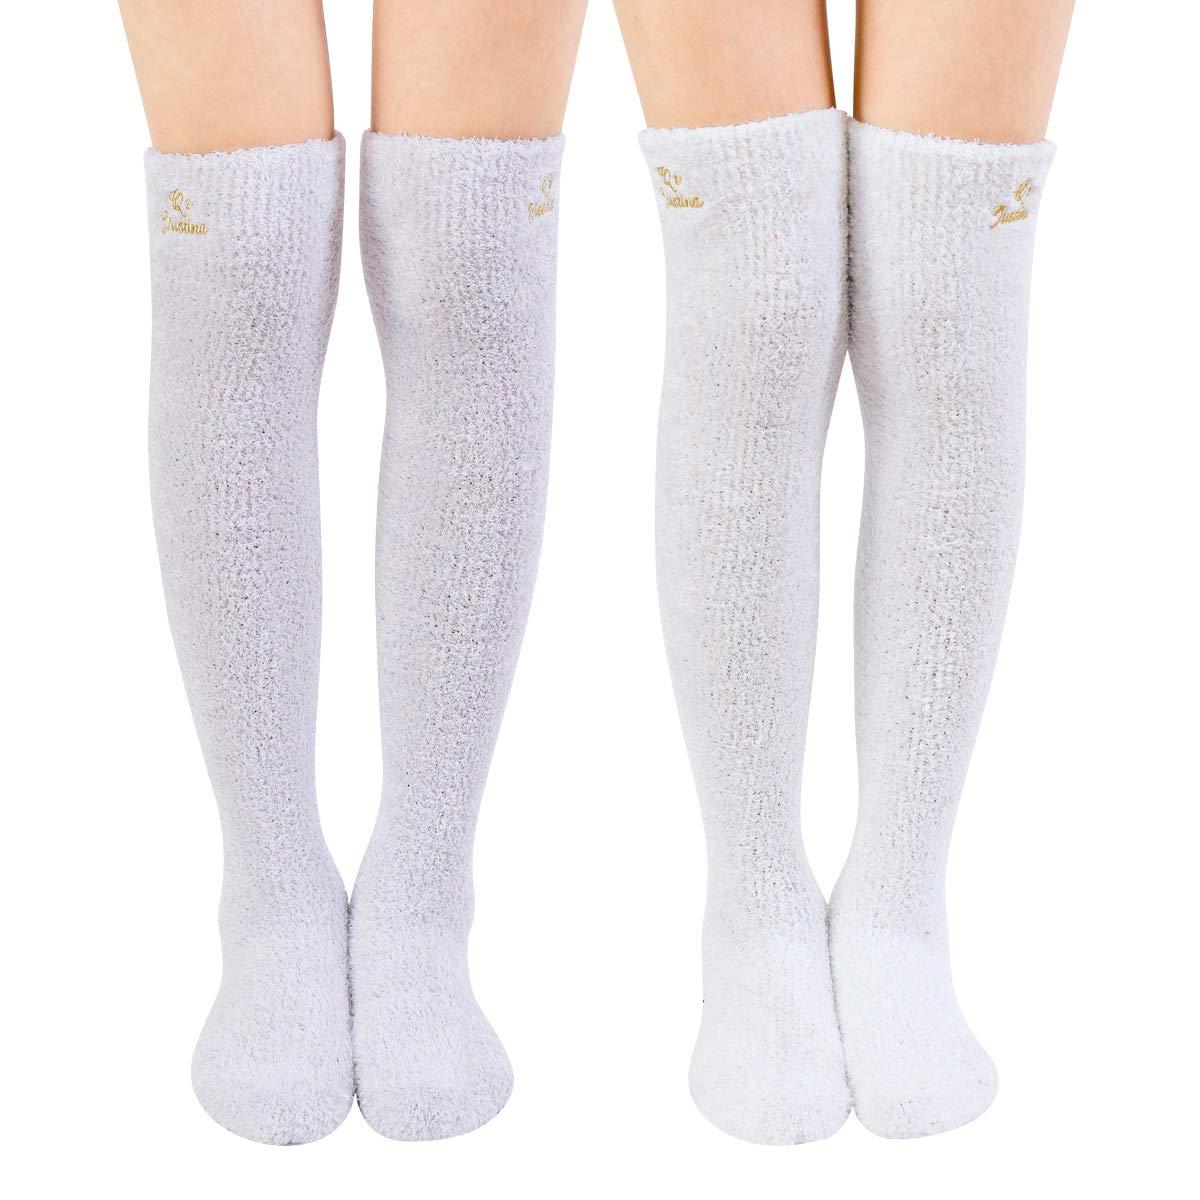 SKOLA Super Soft Warm Over The Knee High Long Winter Cozy Slipper Socks-2 Pairs FBCABRCTW2